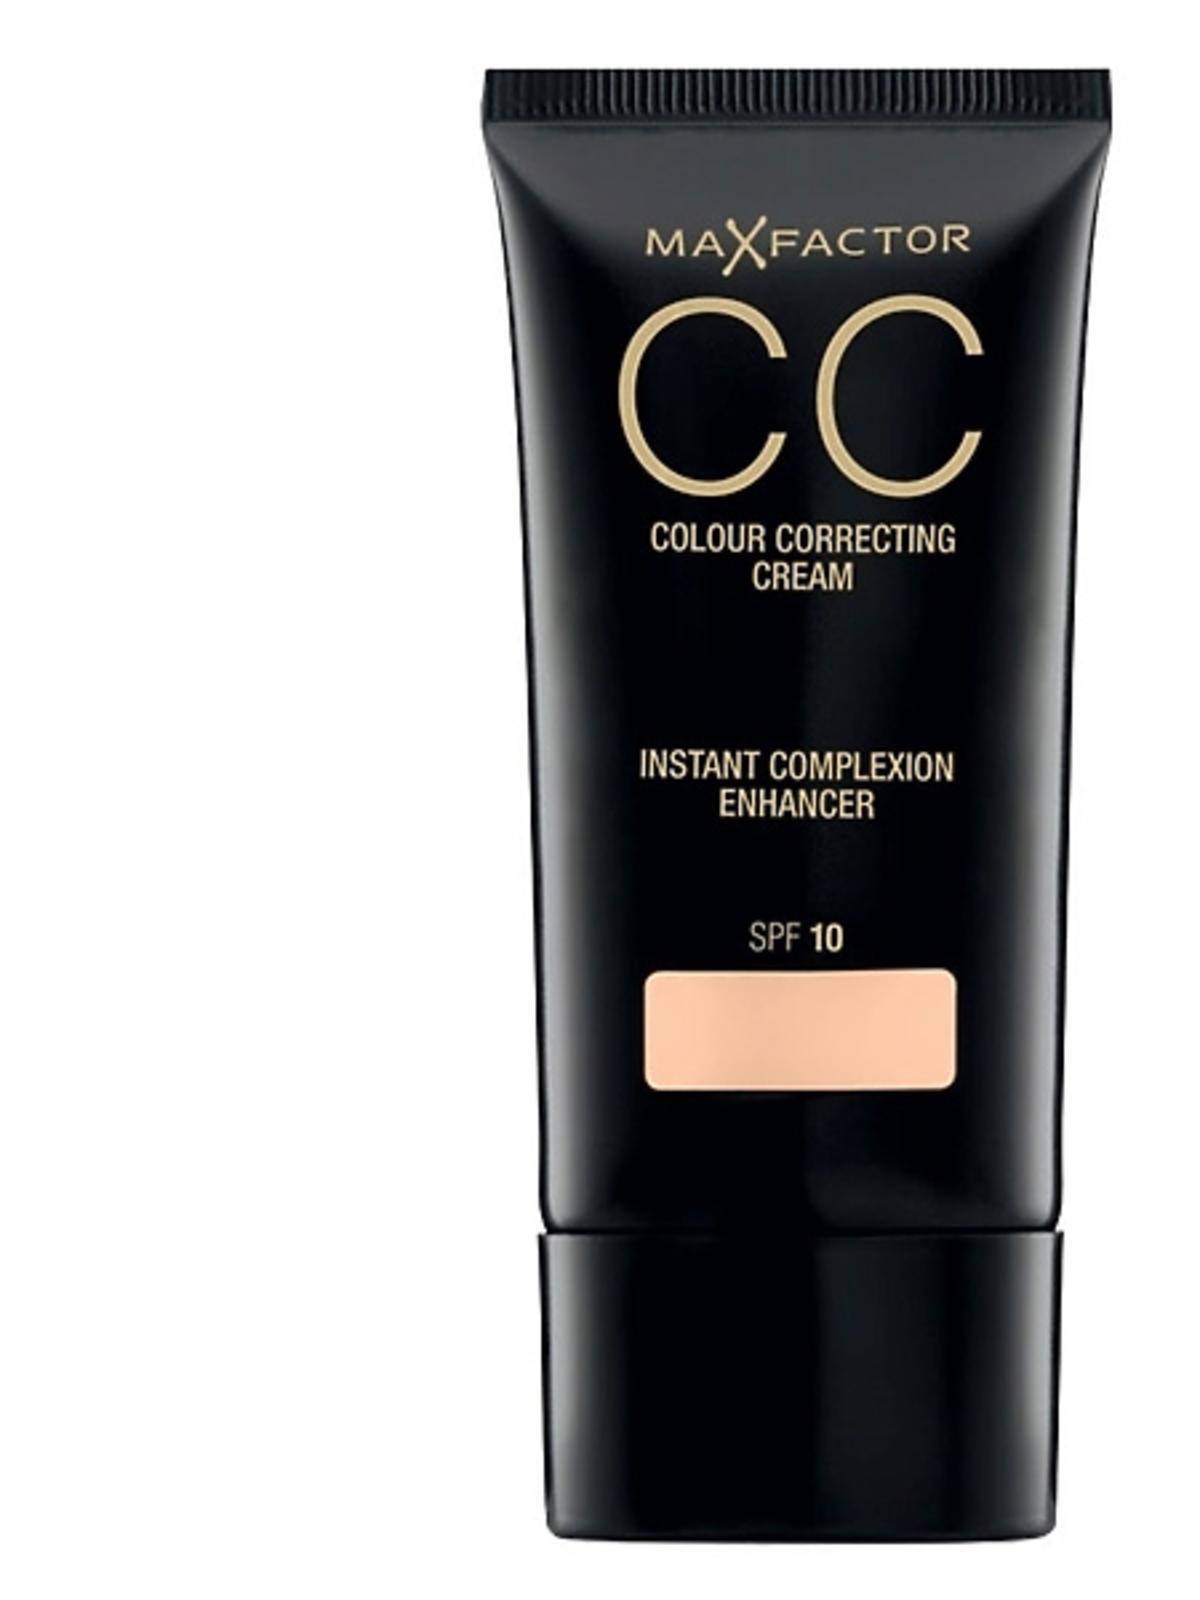 Max-factor-cc-cream-wiosna-2013.jpg